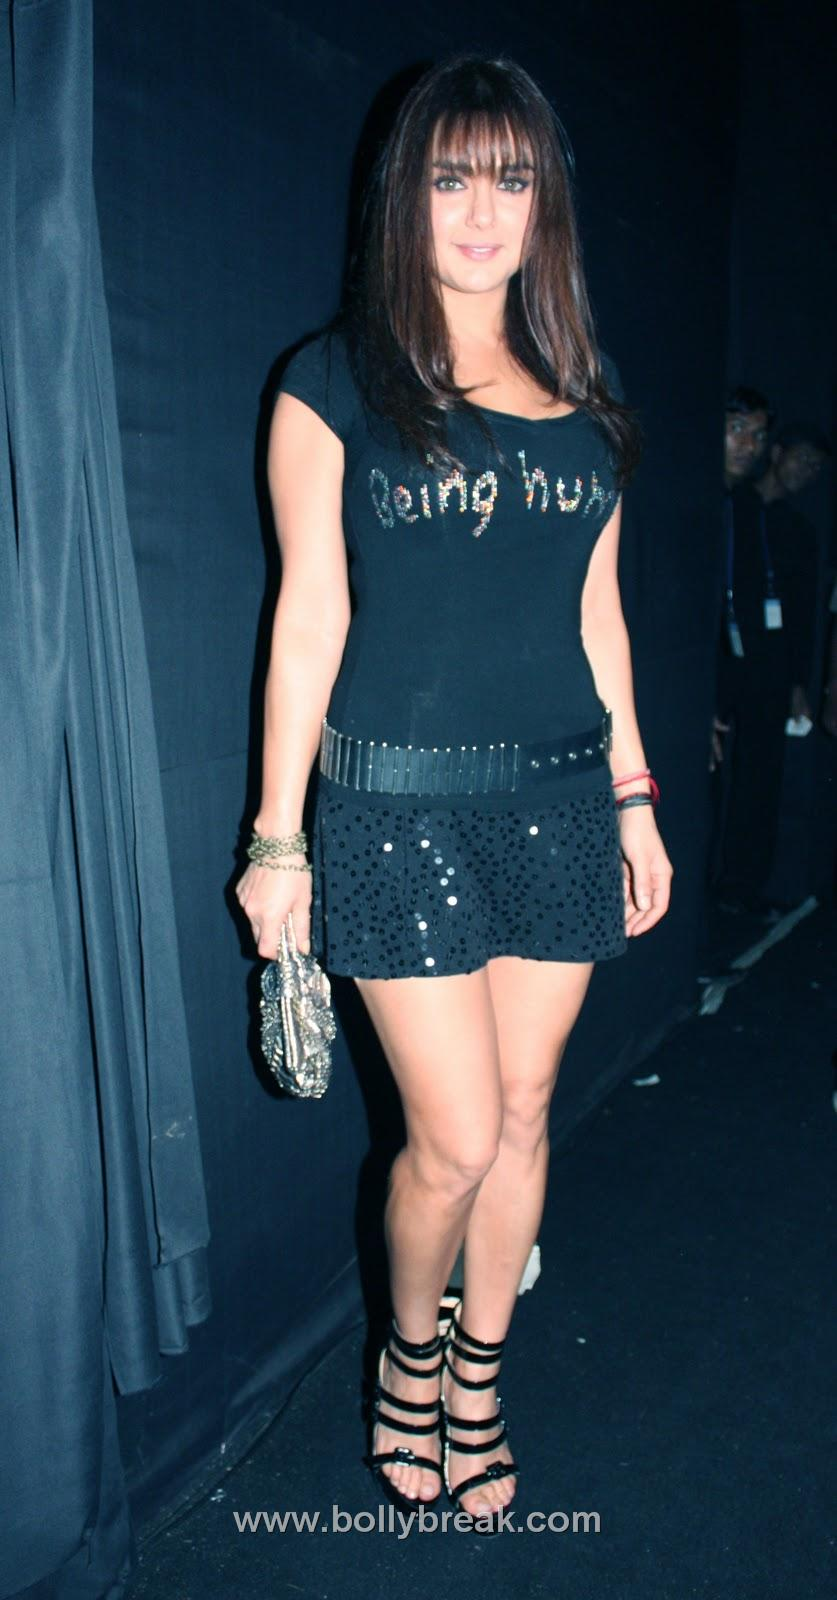 Preity Zinta Event Photo Gallery - India Forums